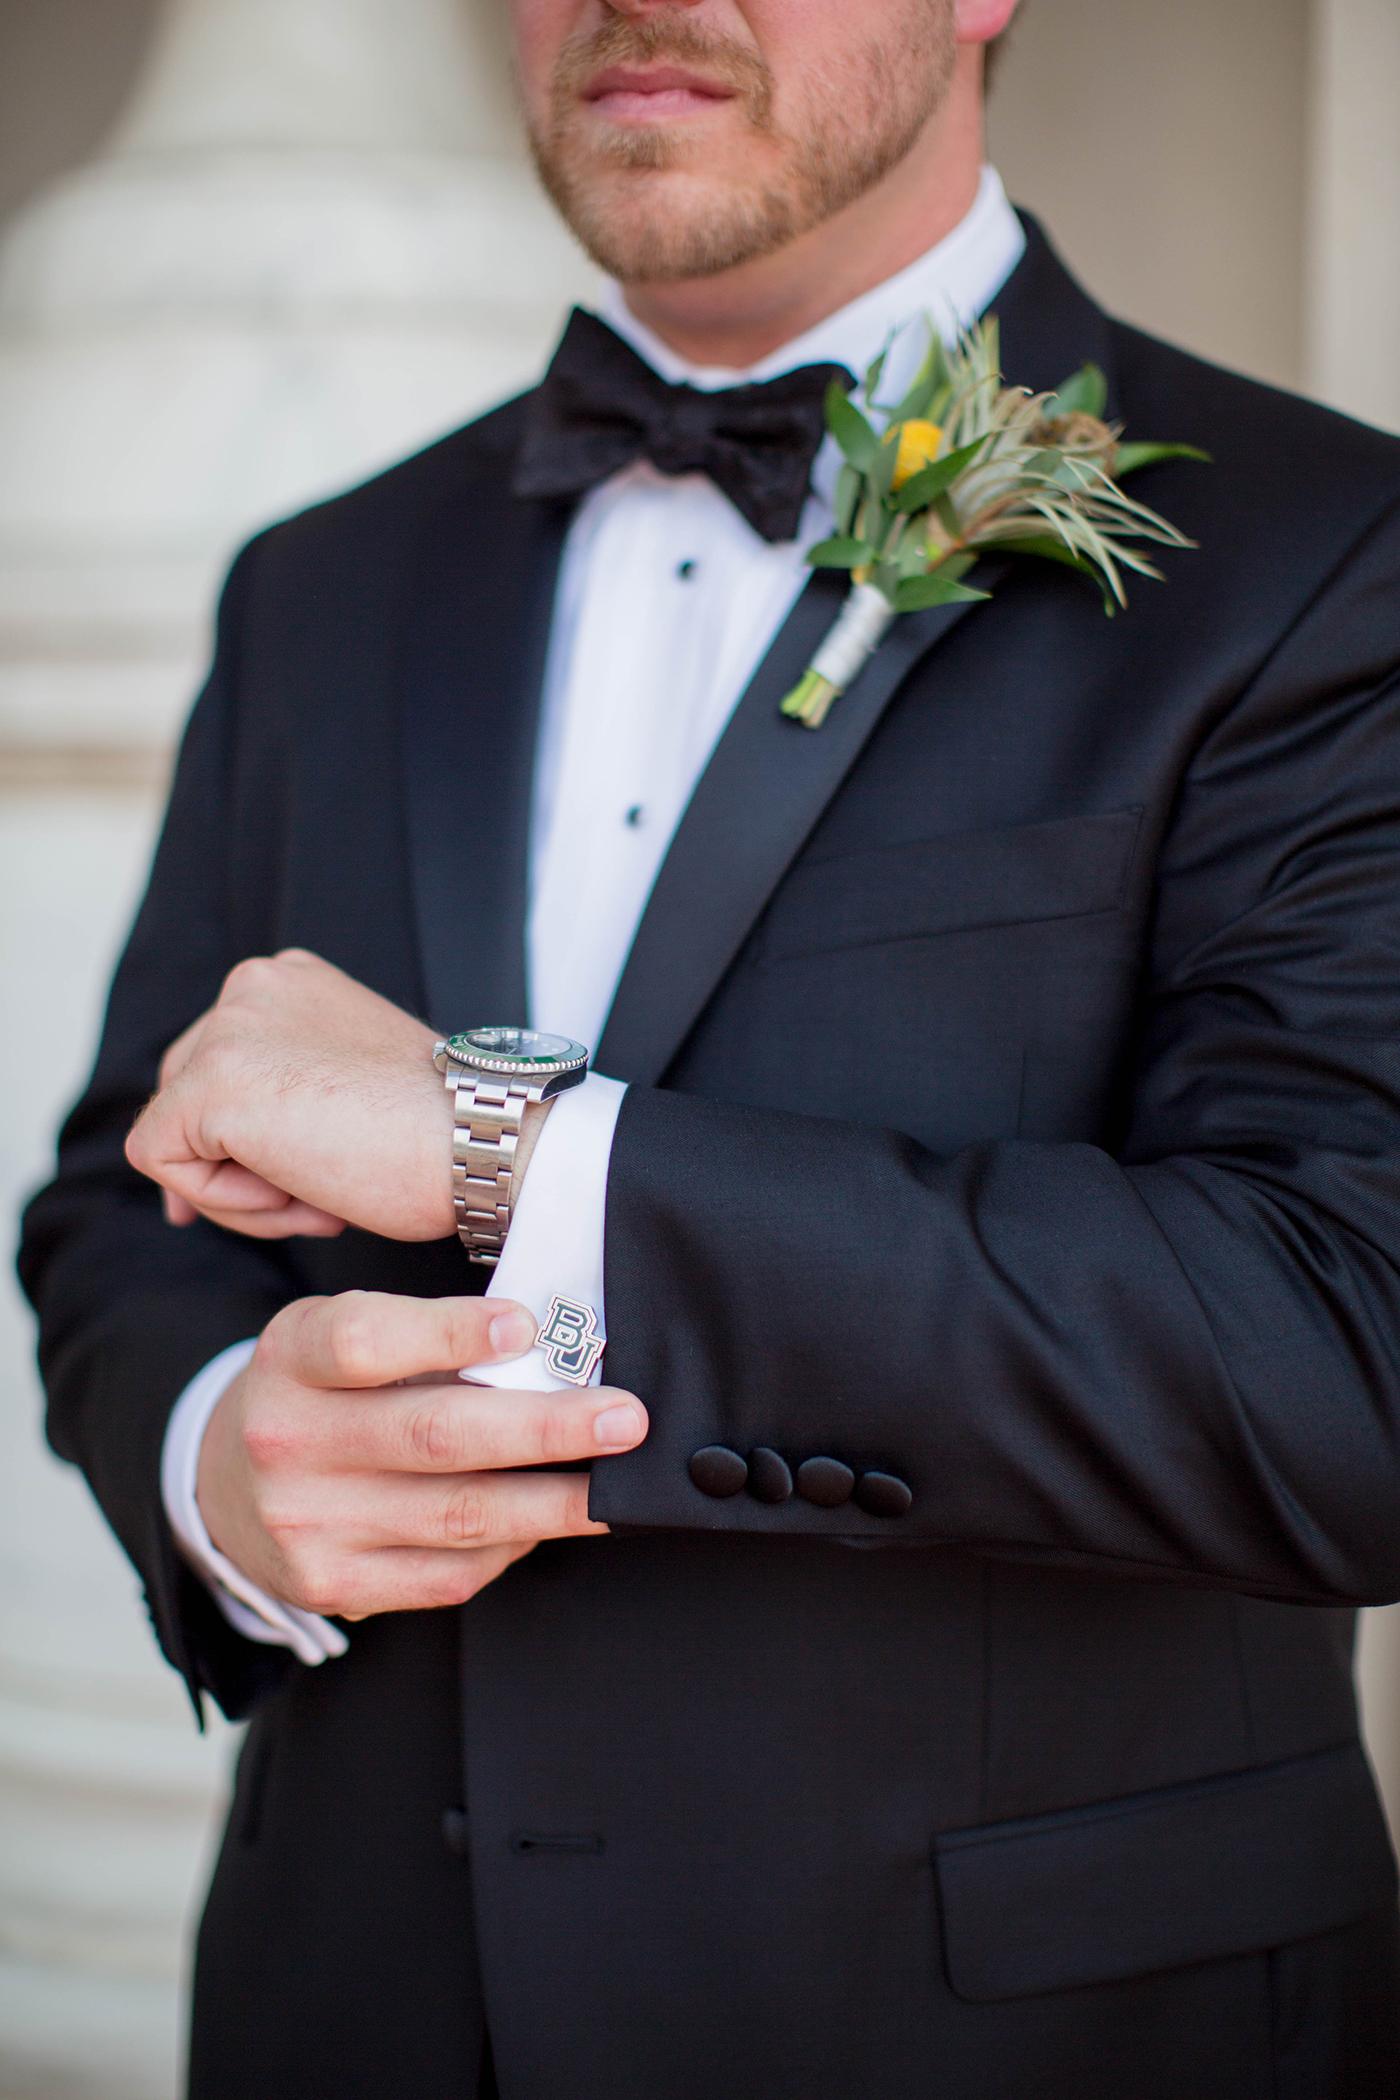 Dallas TX Wedding Planner - Allday Events - Hall on Dragon Wedding - 00194.jpg